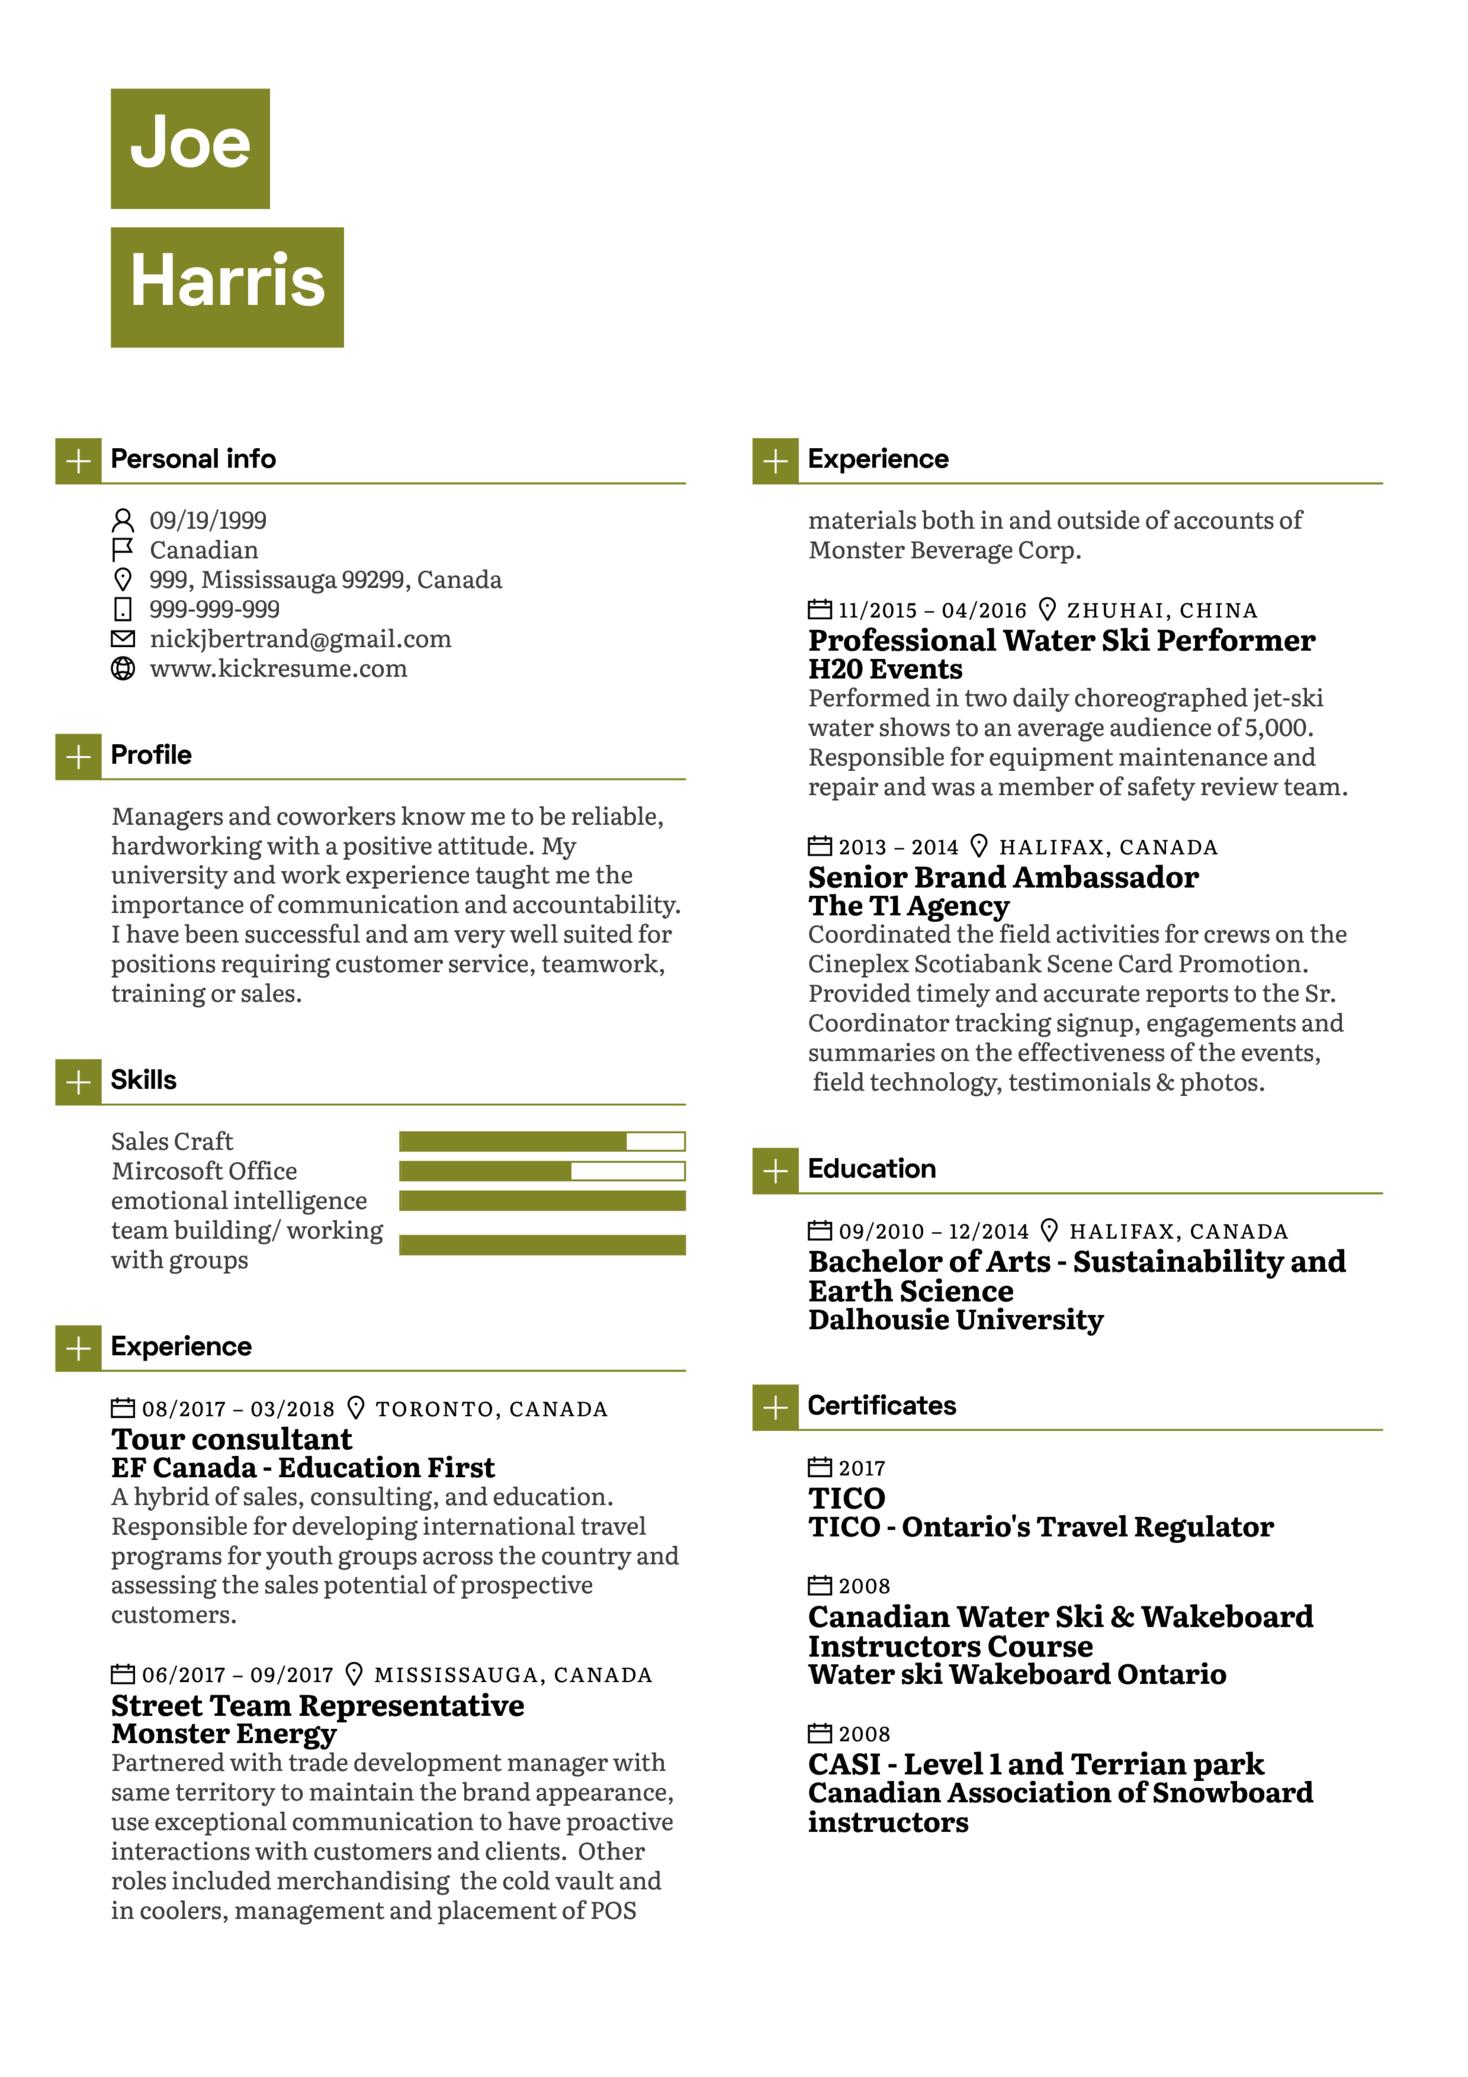 Sales and Customer Representative CV Sample (Parte 1)